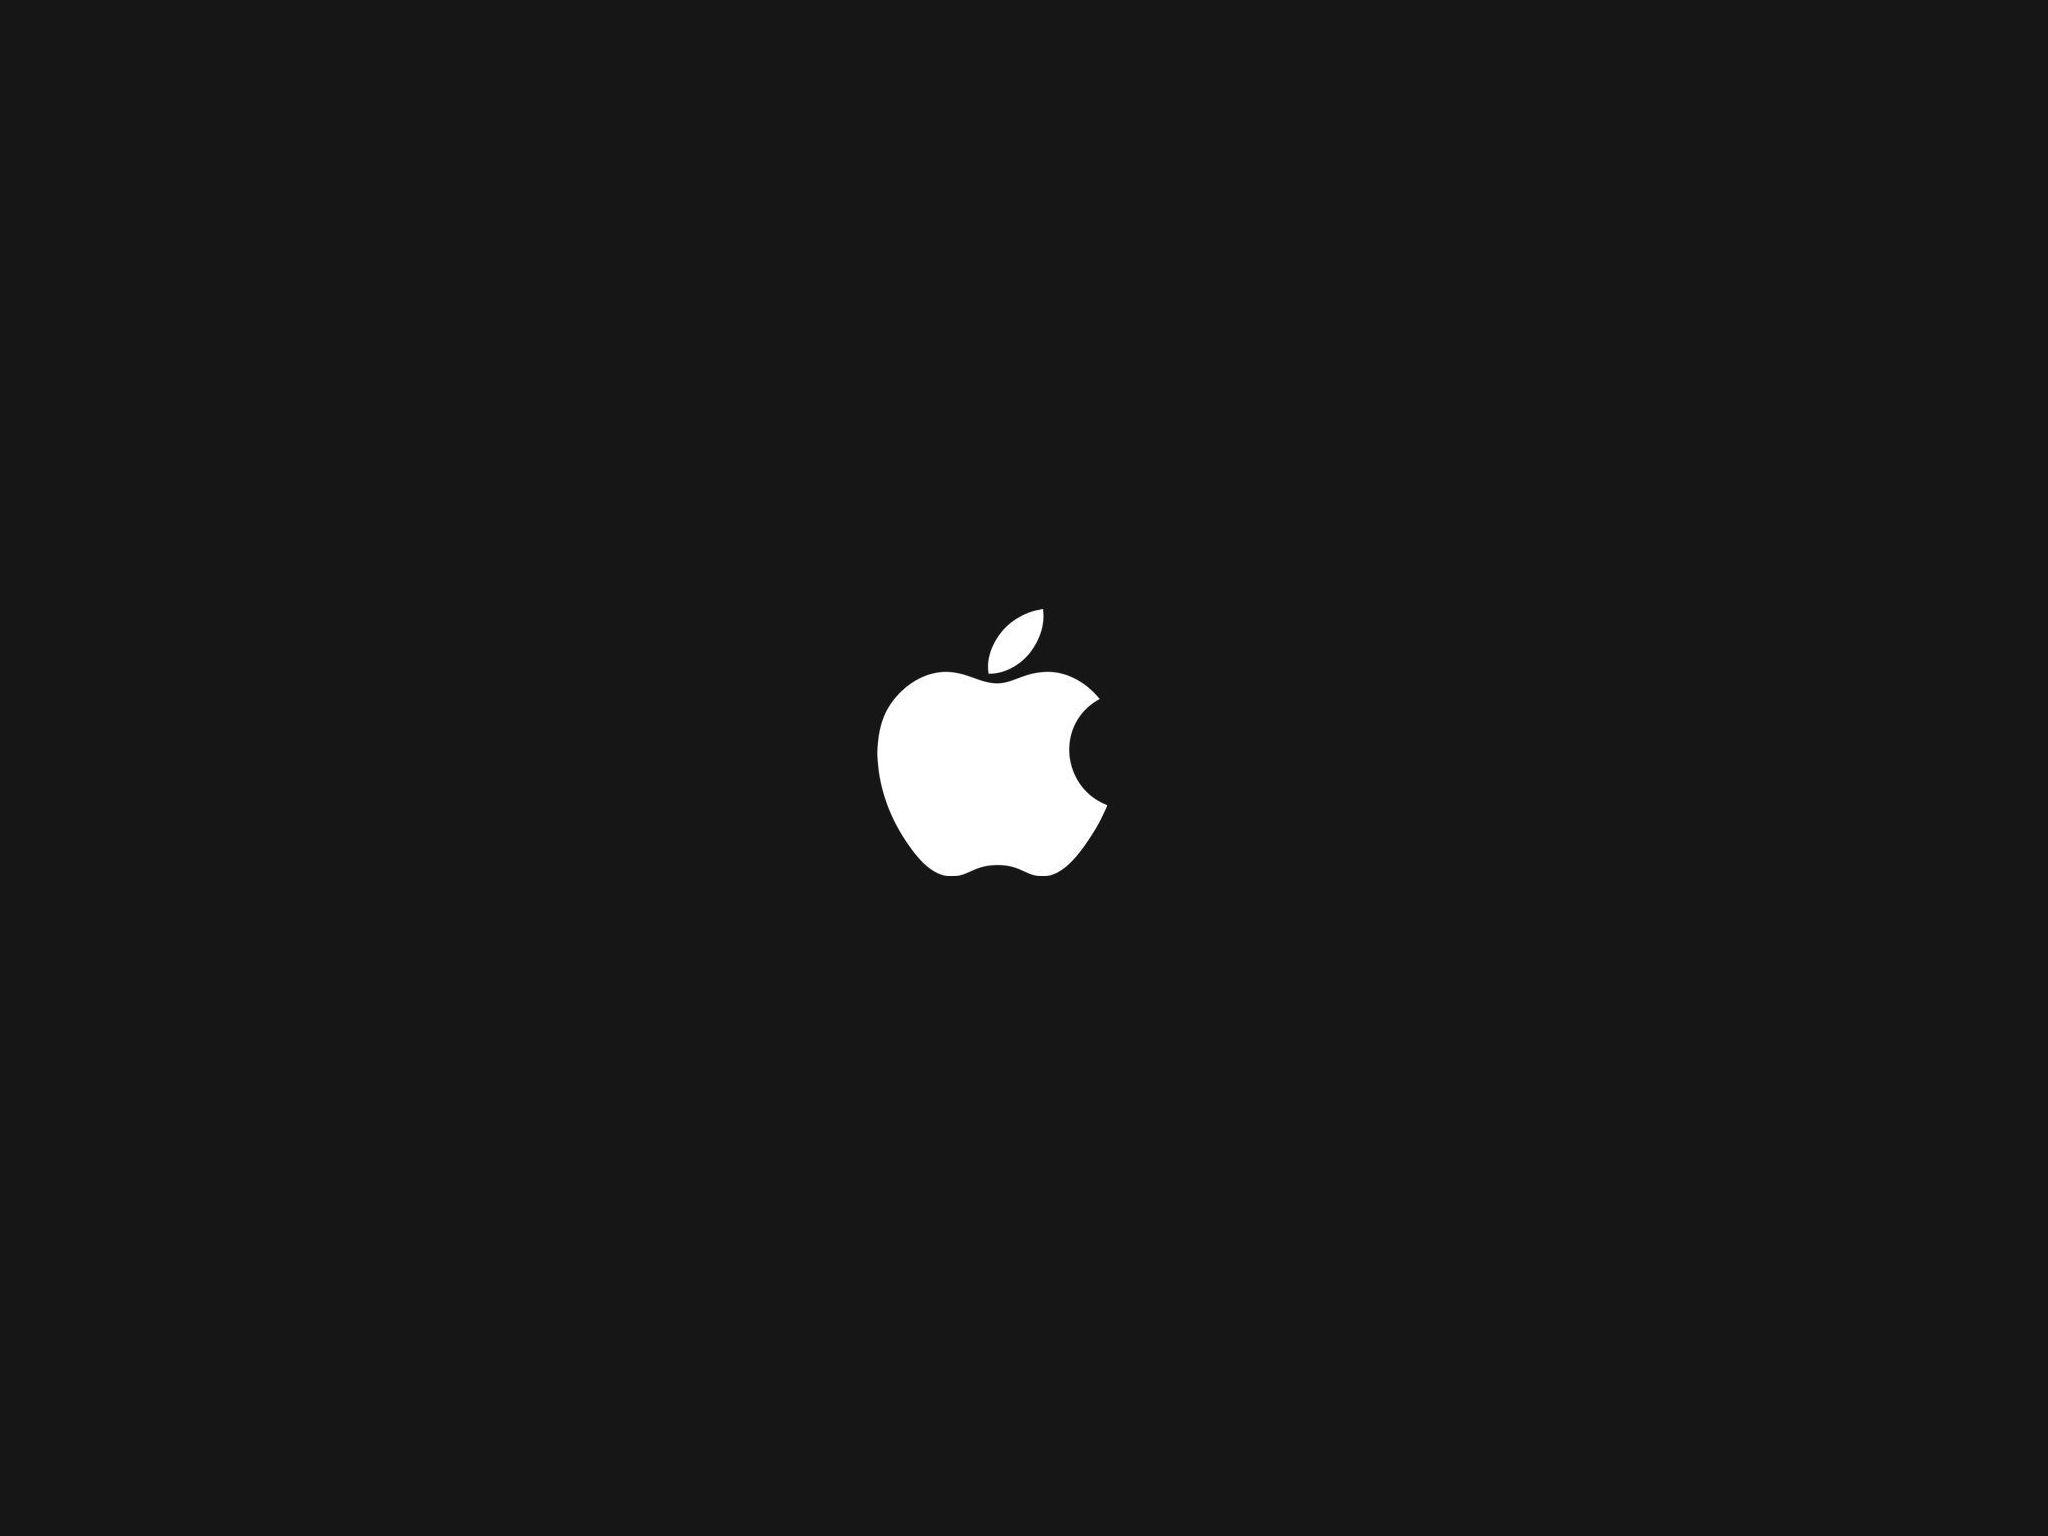 iPadRatina 2048x1536QXG 2048x1536